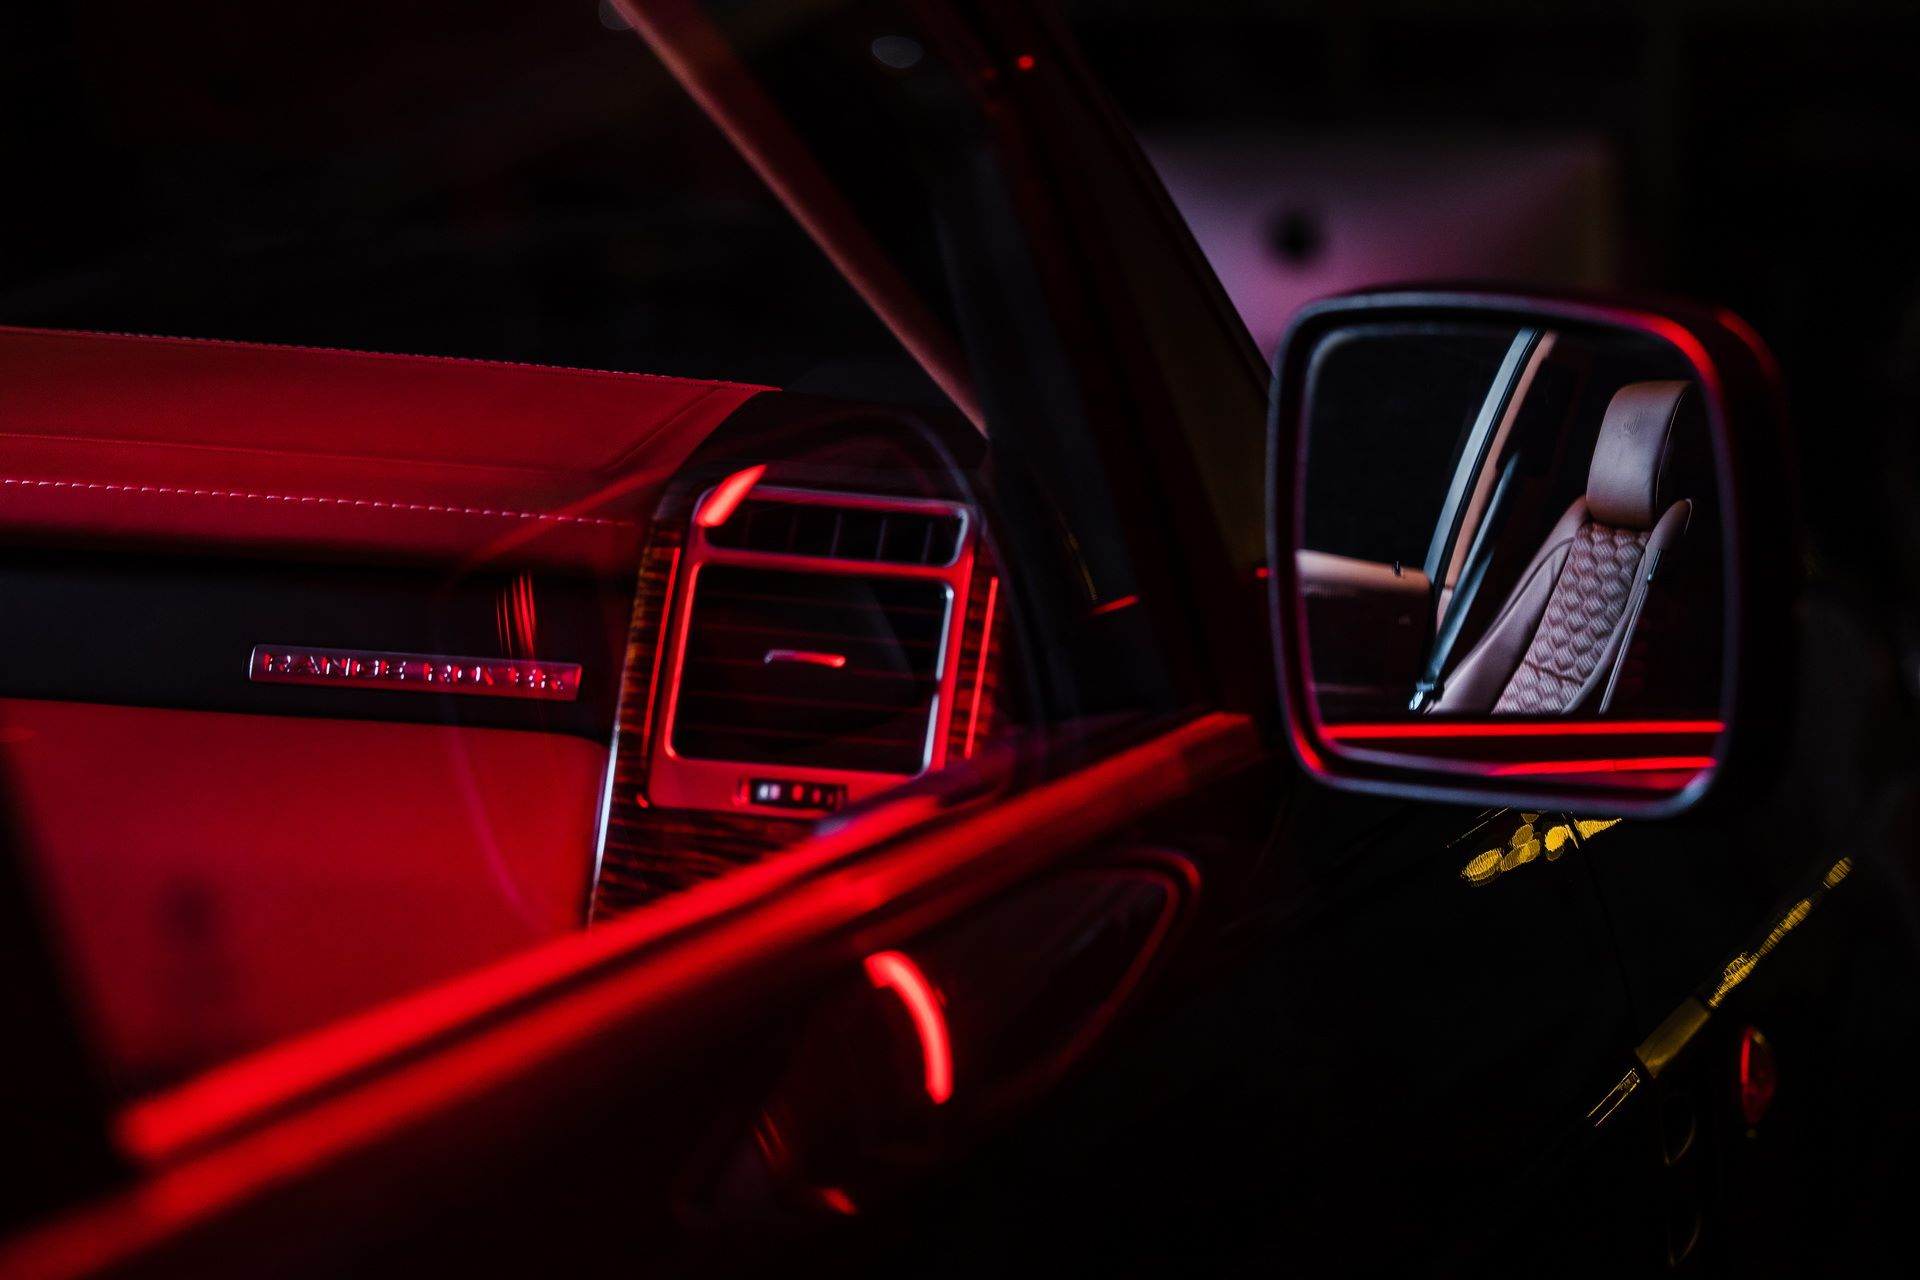 Range-Rover-Autobiography-By-Vilner-17